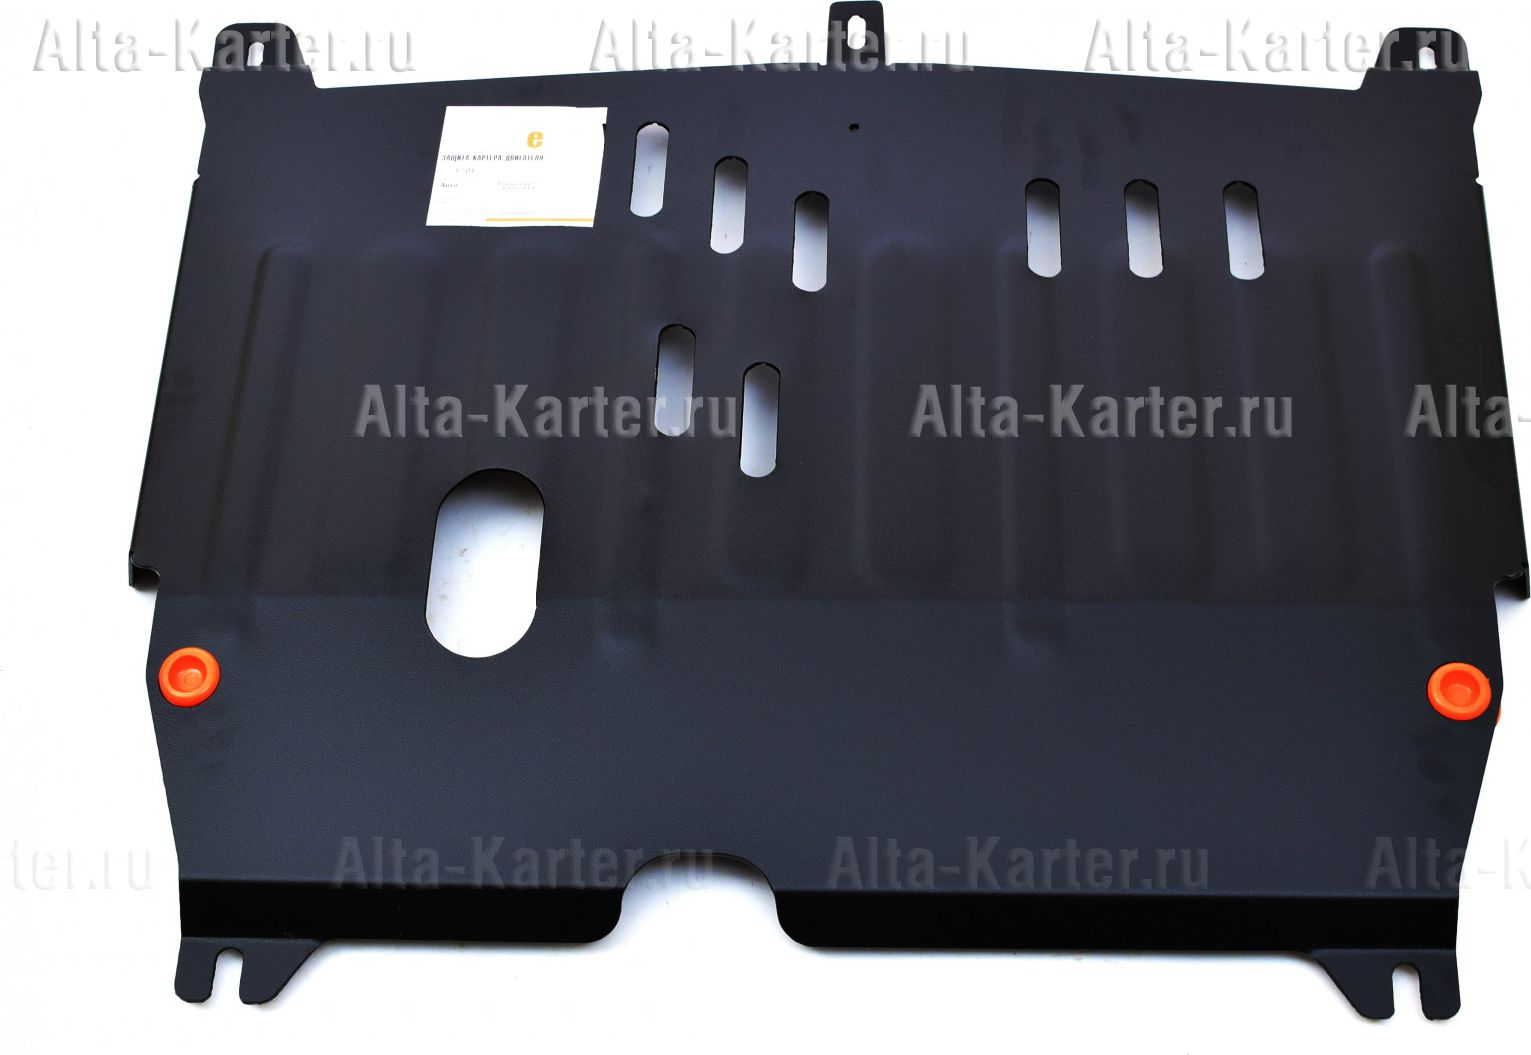 Защита Alfeco для картера и КПП Toyota Aygo I 2005-2014. Артикул ALF.17.01